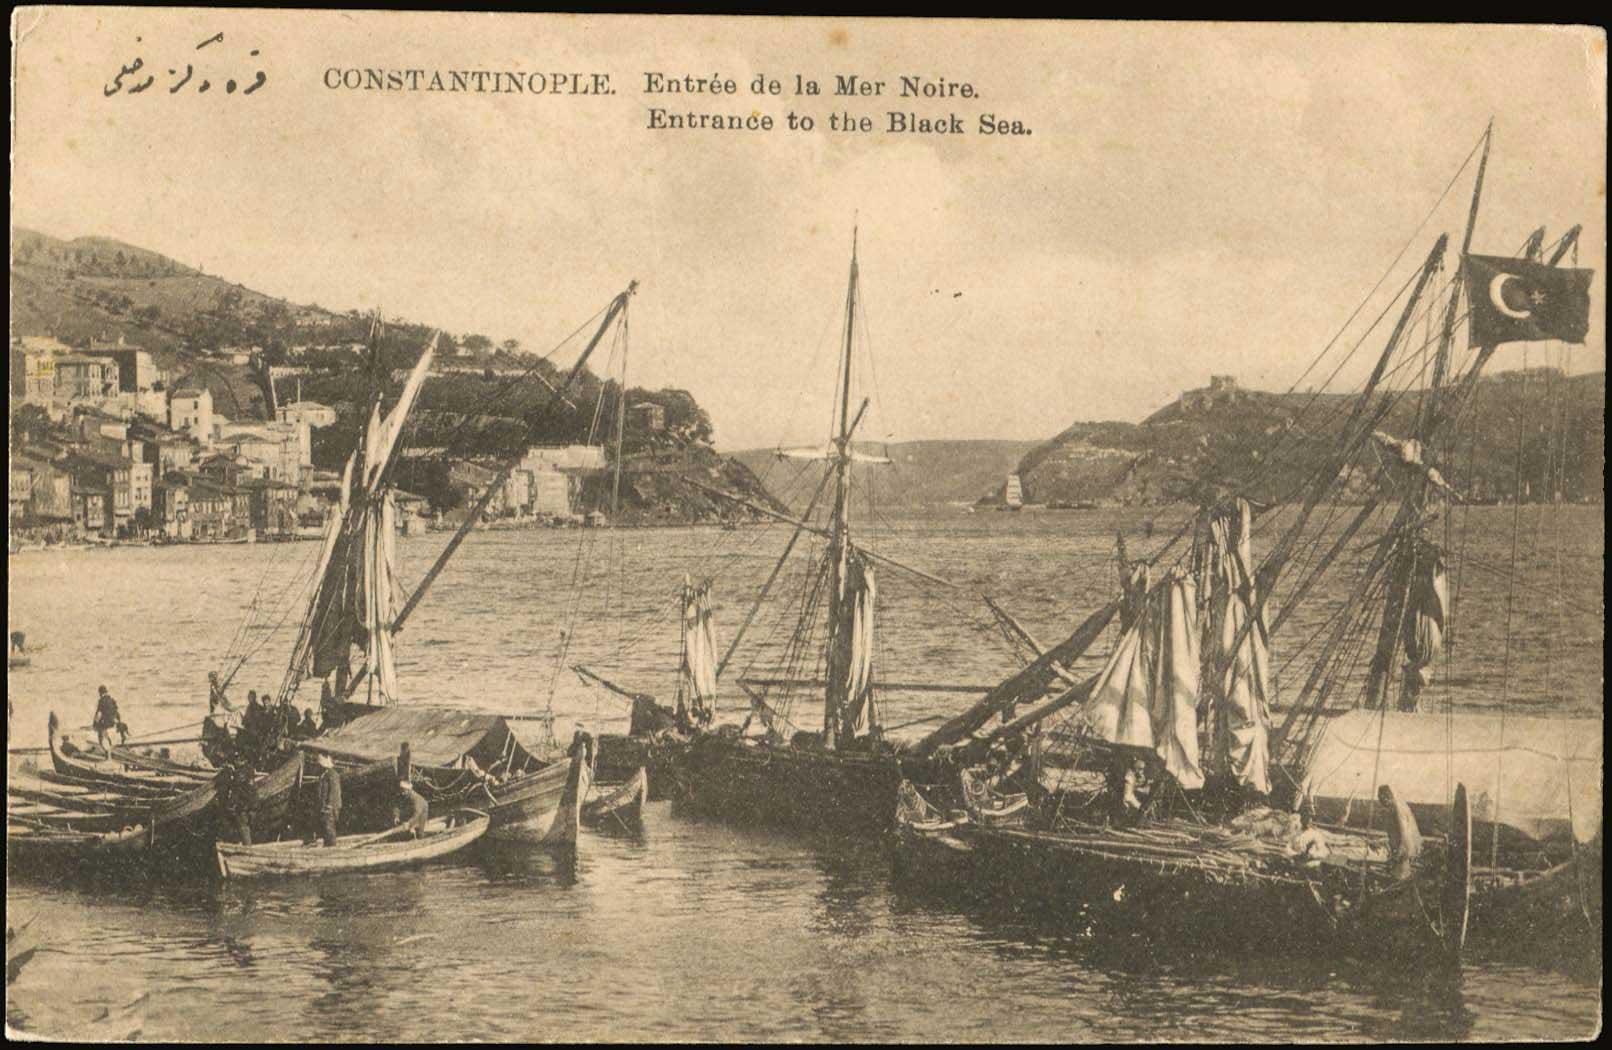 Lot 1554 - picture postcards SMYRNE, CONSTANTINOPLE, ASIA MINOR -  A. Karamitsos Postal & Live Internet Auction 680 General Philatelic Auction